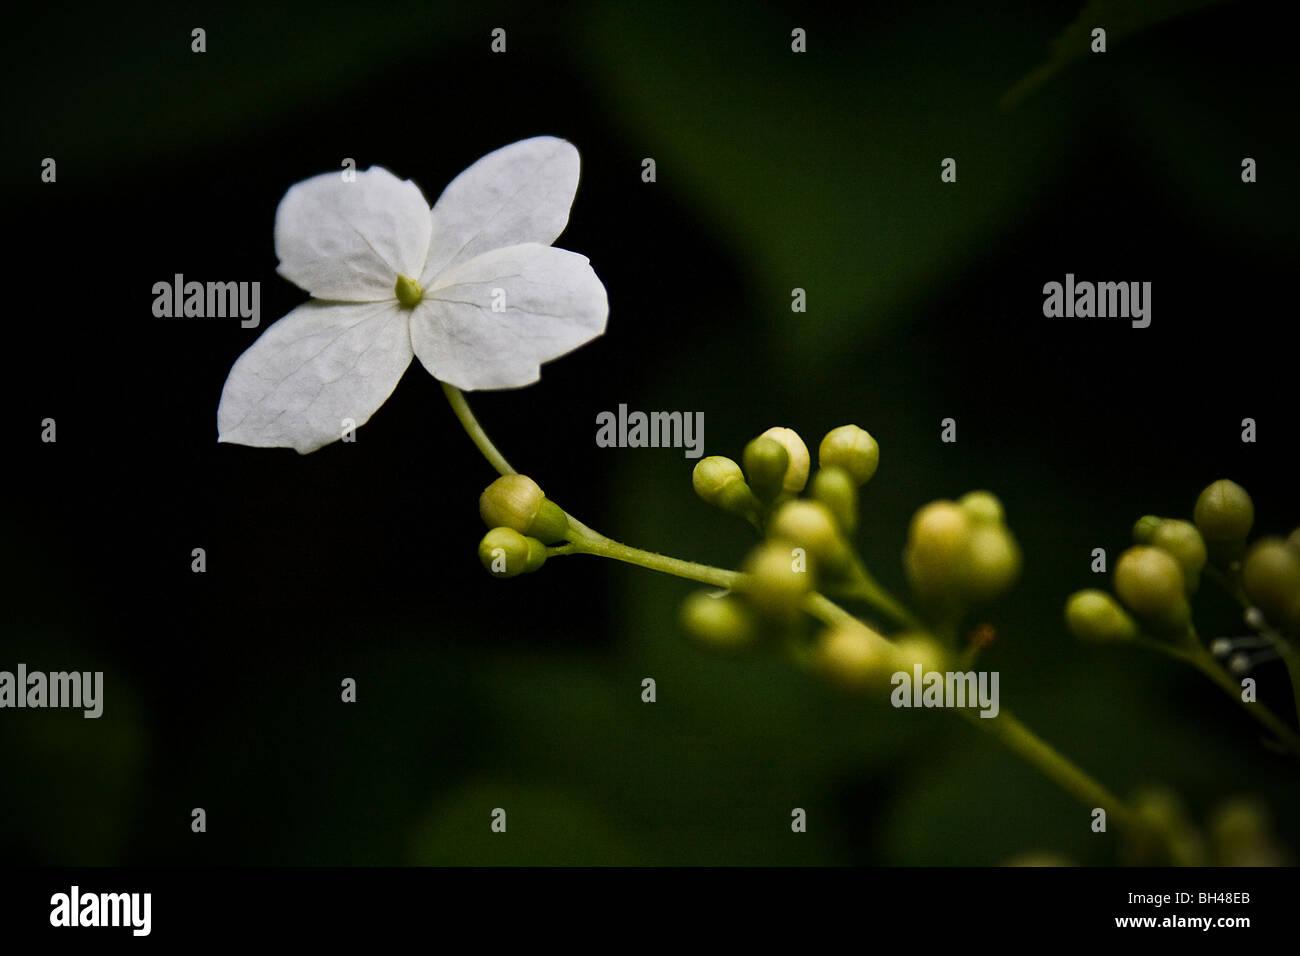 Lacecup type flowerhead of the climbing hydrangea (Hydrangea petiolaris). - Stock Image